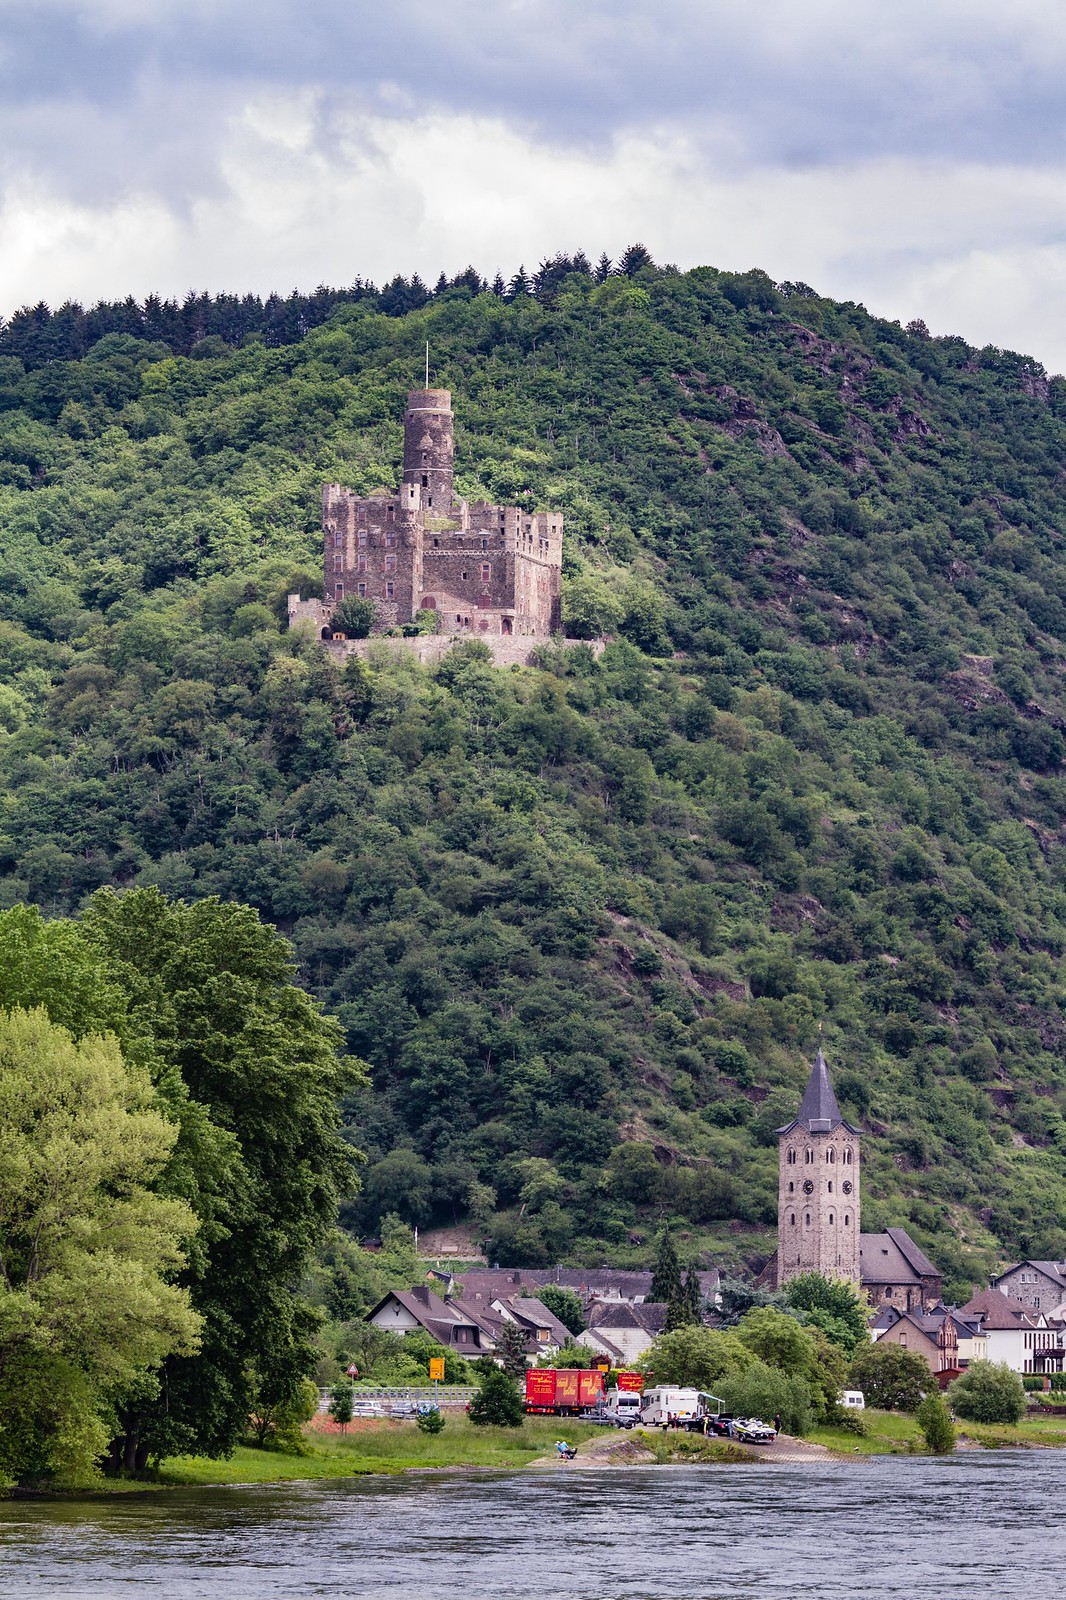 Castillo de Maus